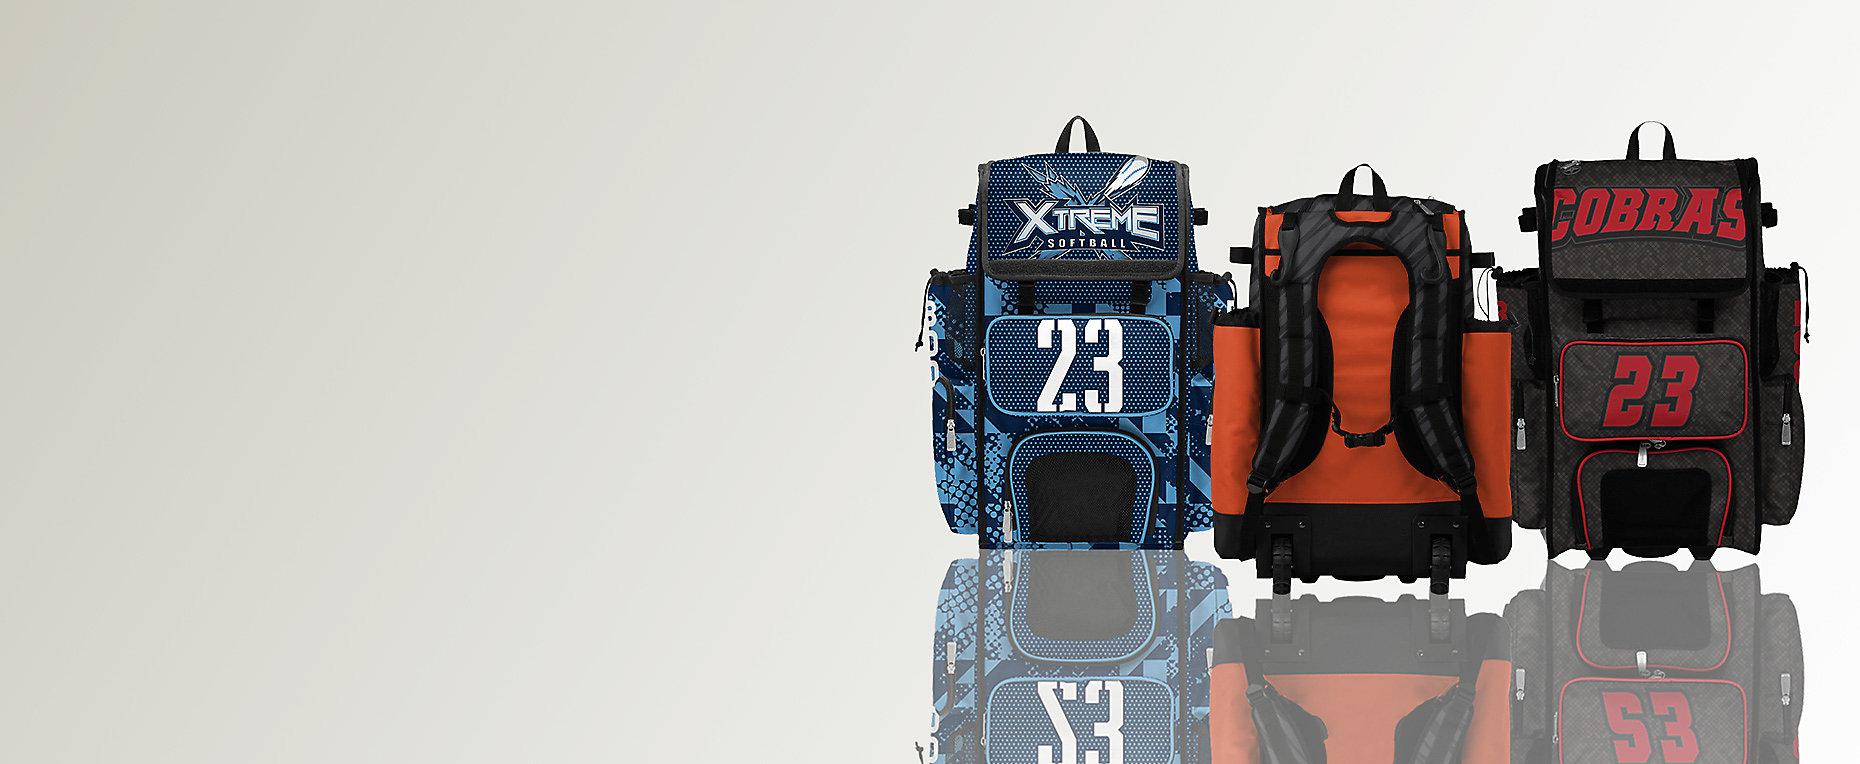 Custom Superpack Back Pack, Custom Superpack Hybrid Rolling Back Pack, Custom Superpack Rolling Bat Bag